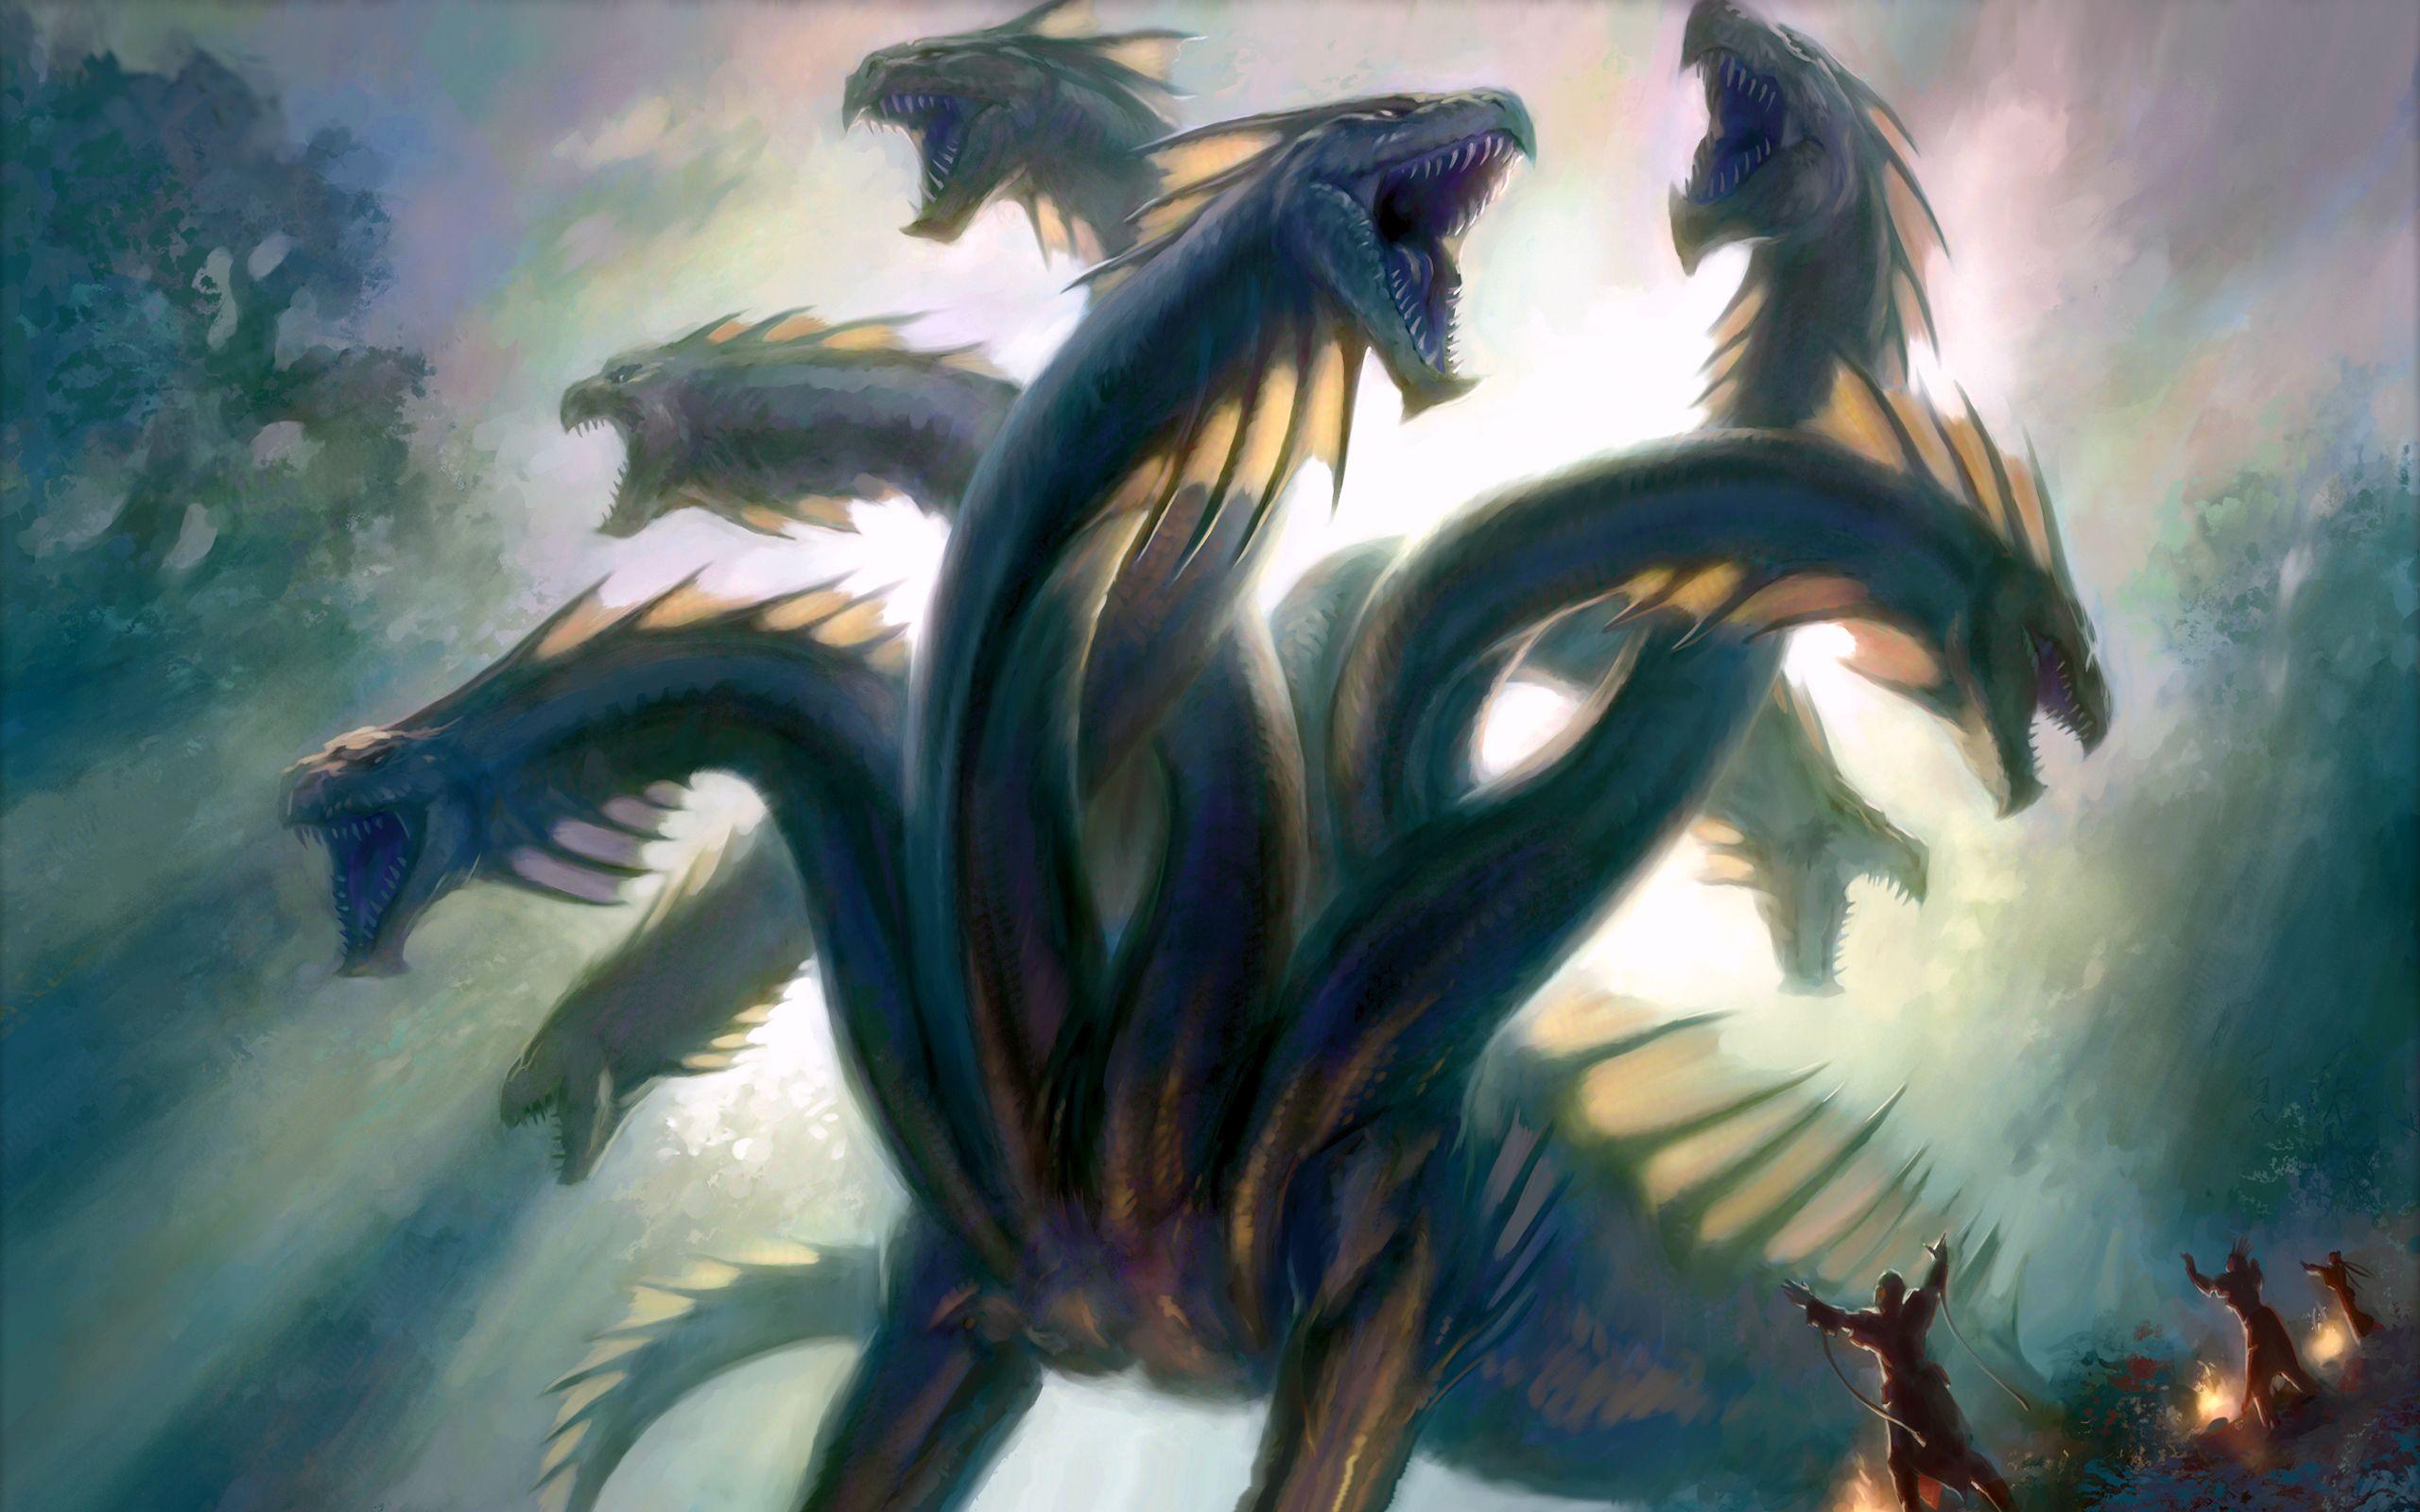 fantasy hydra dragon wallpaper 2560x1600 27930